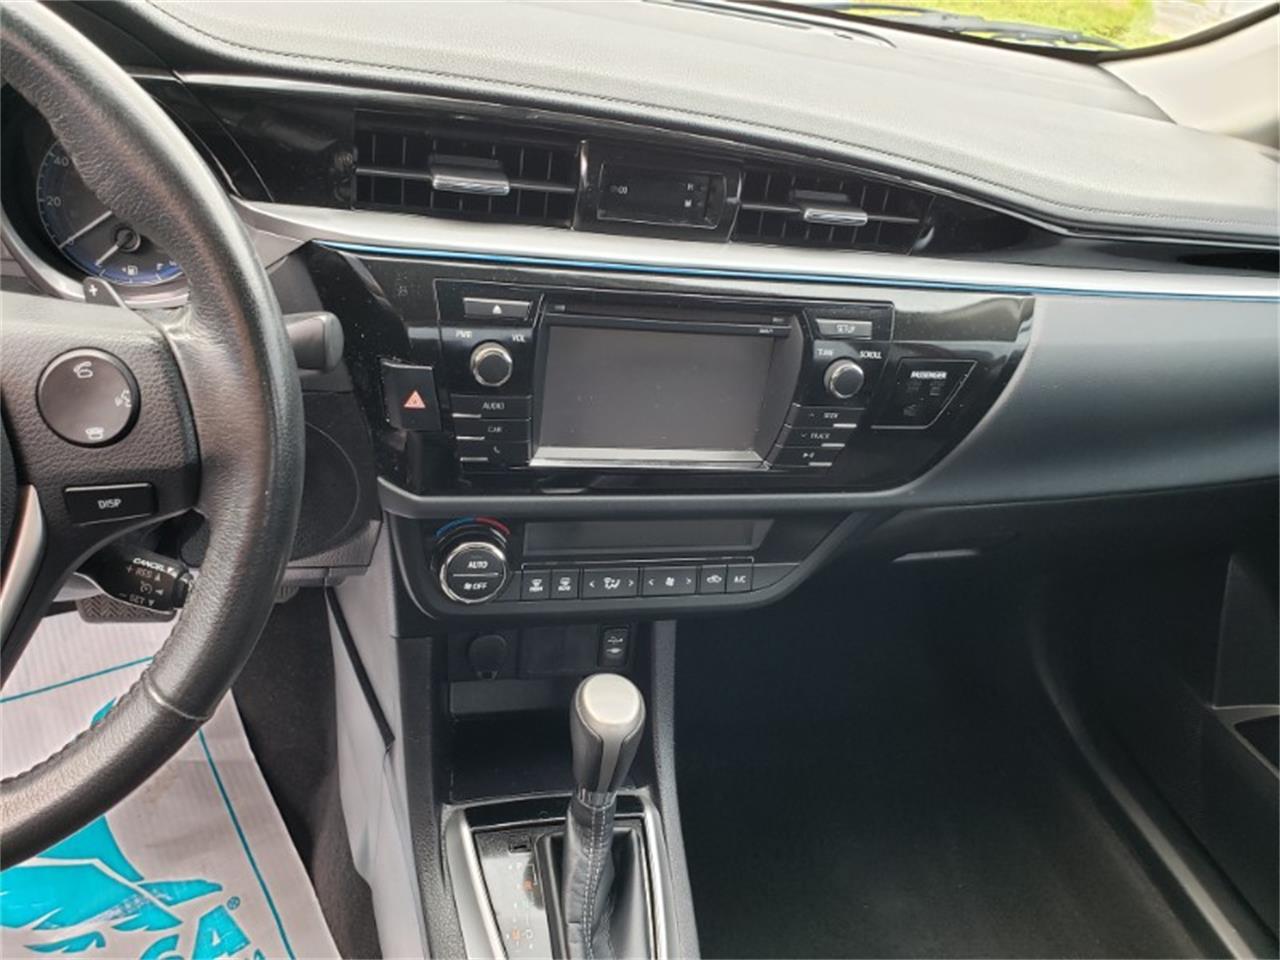 2016 Toyota Corolla (CC-1294118) for sale in Tavares, Florida